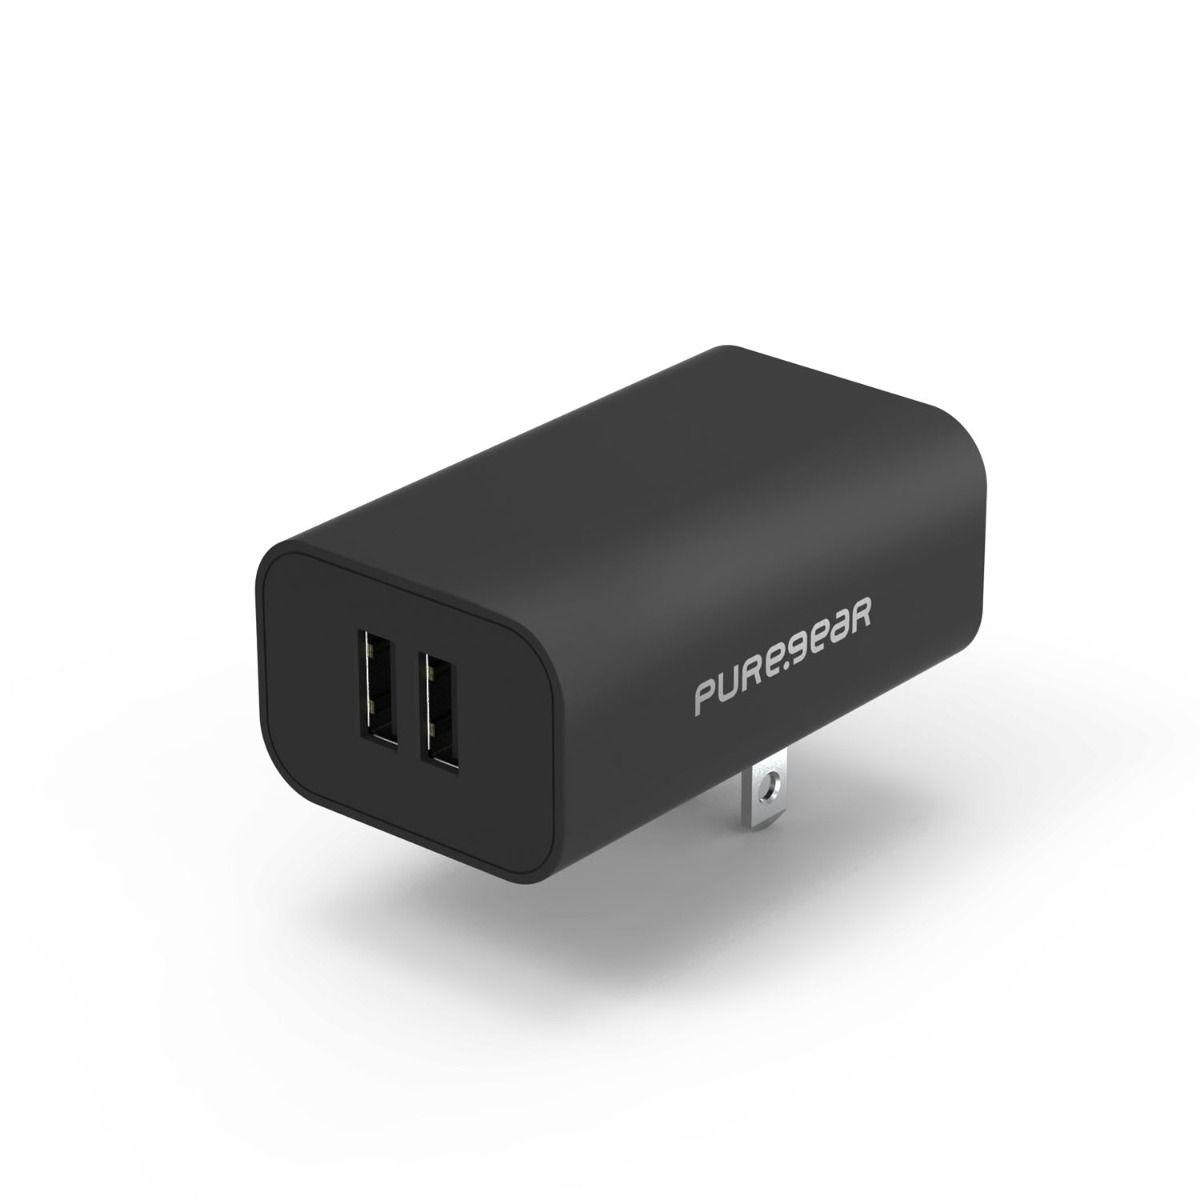 24W Universal Dual USB-A Wall Charger 5V/4.8A - Black